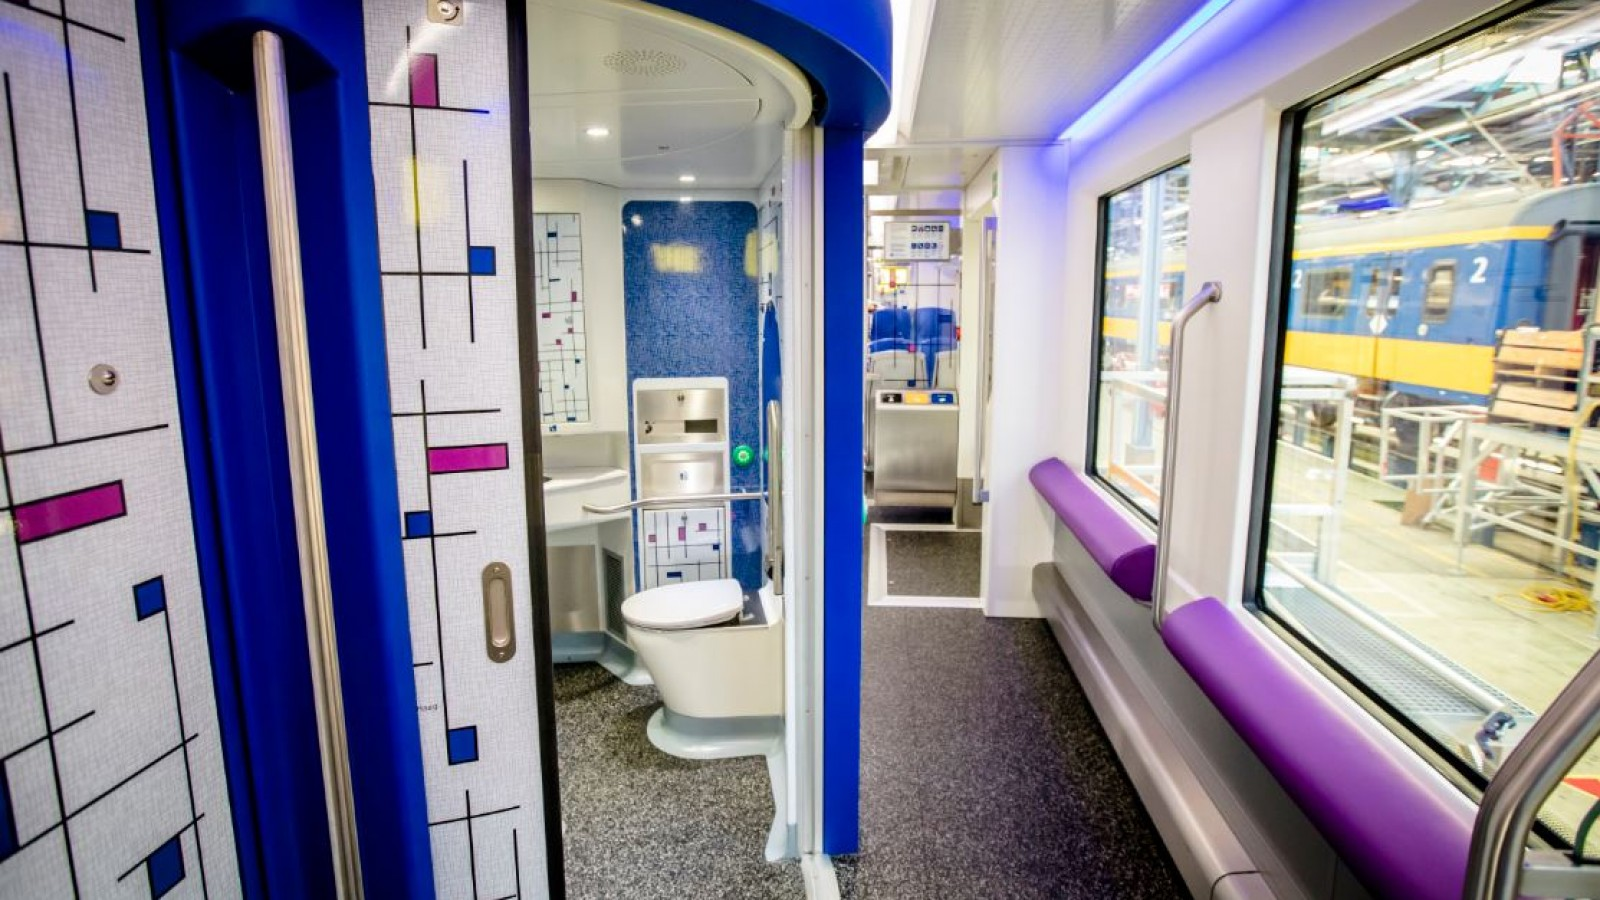 Geen Toilet In Sprinter.Ombudsman Openbaar Vervoer Wil Toilet Op Alle Stations En In